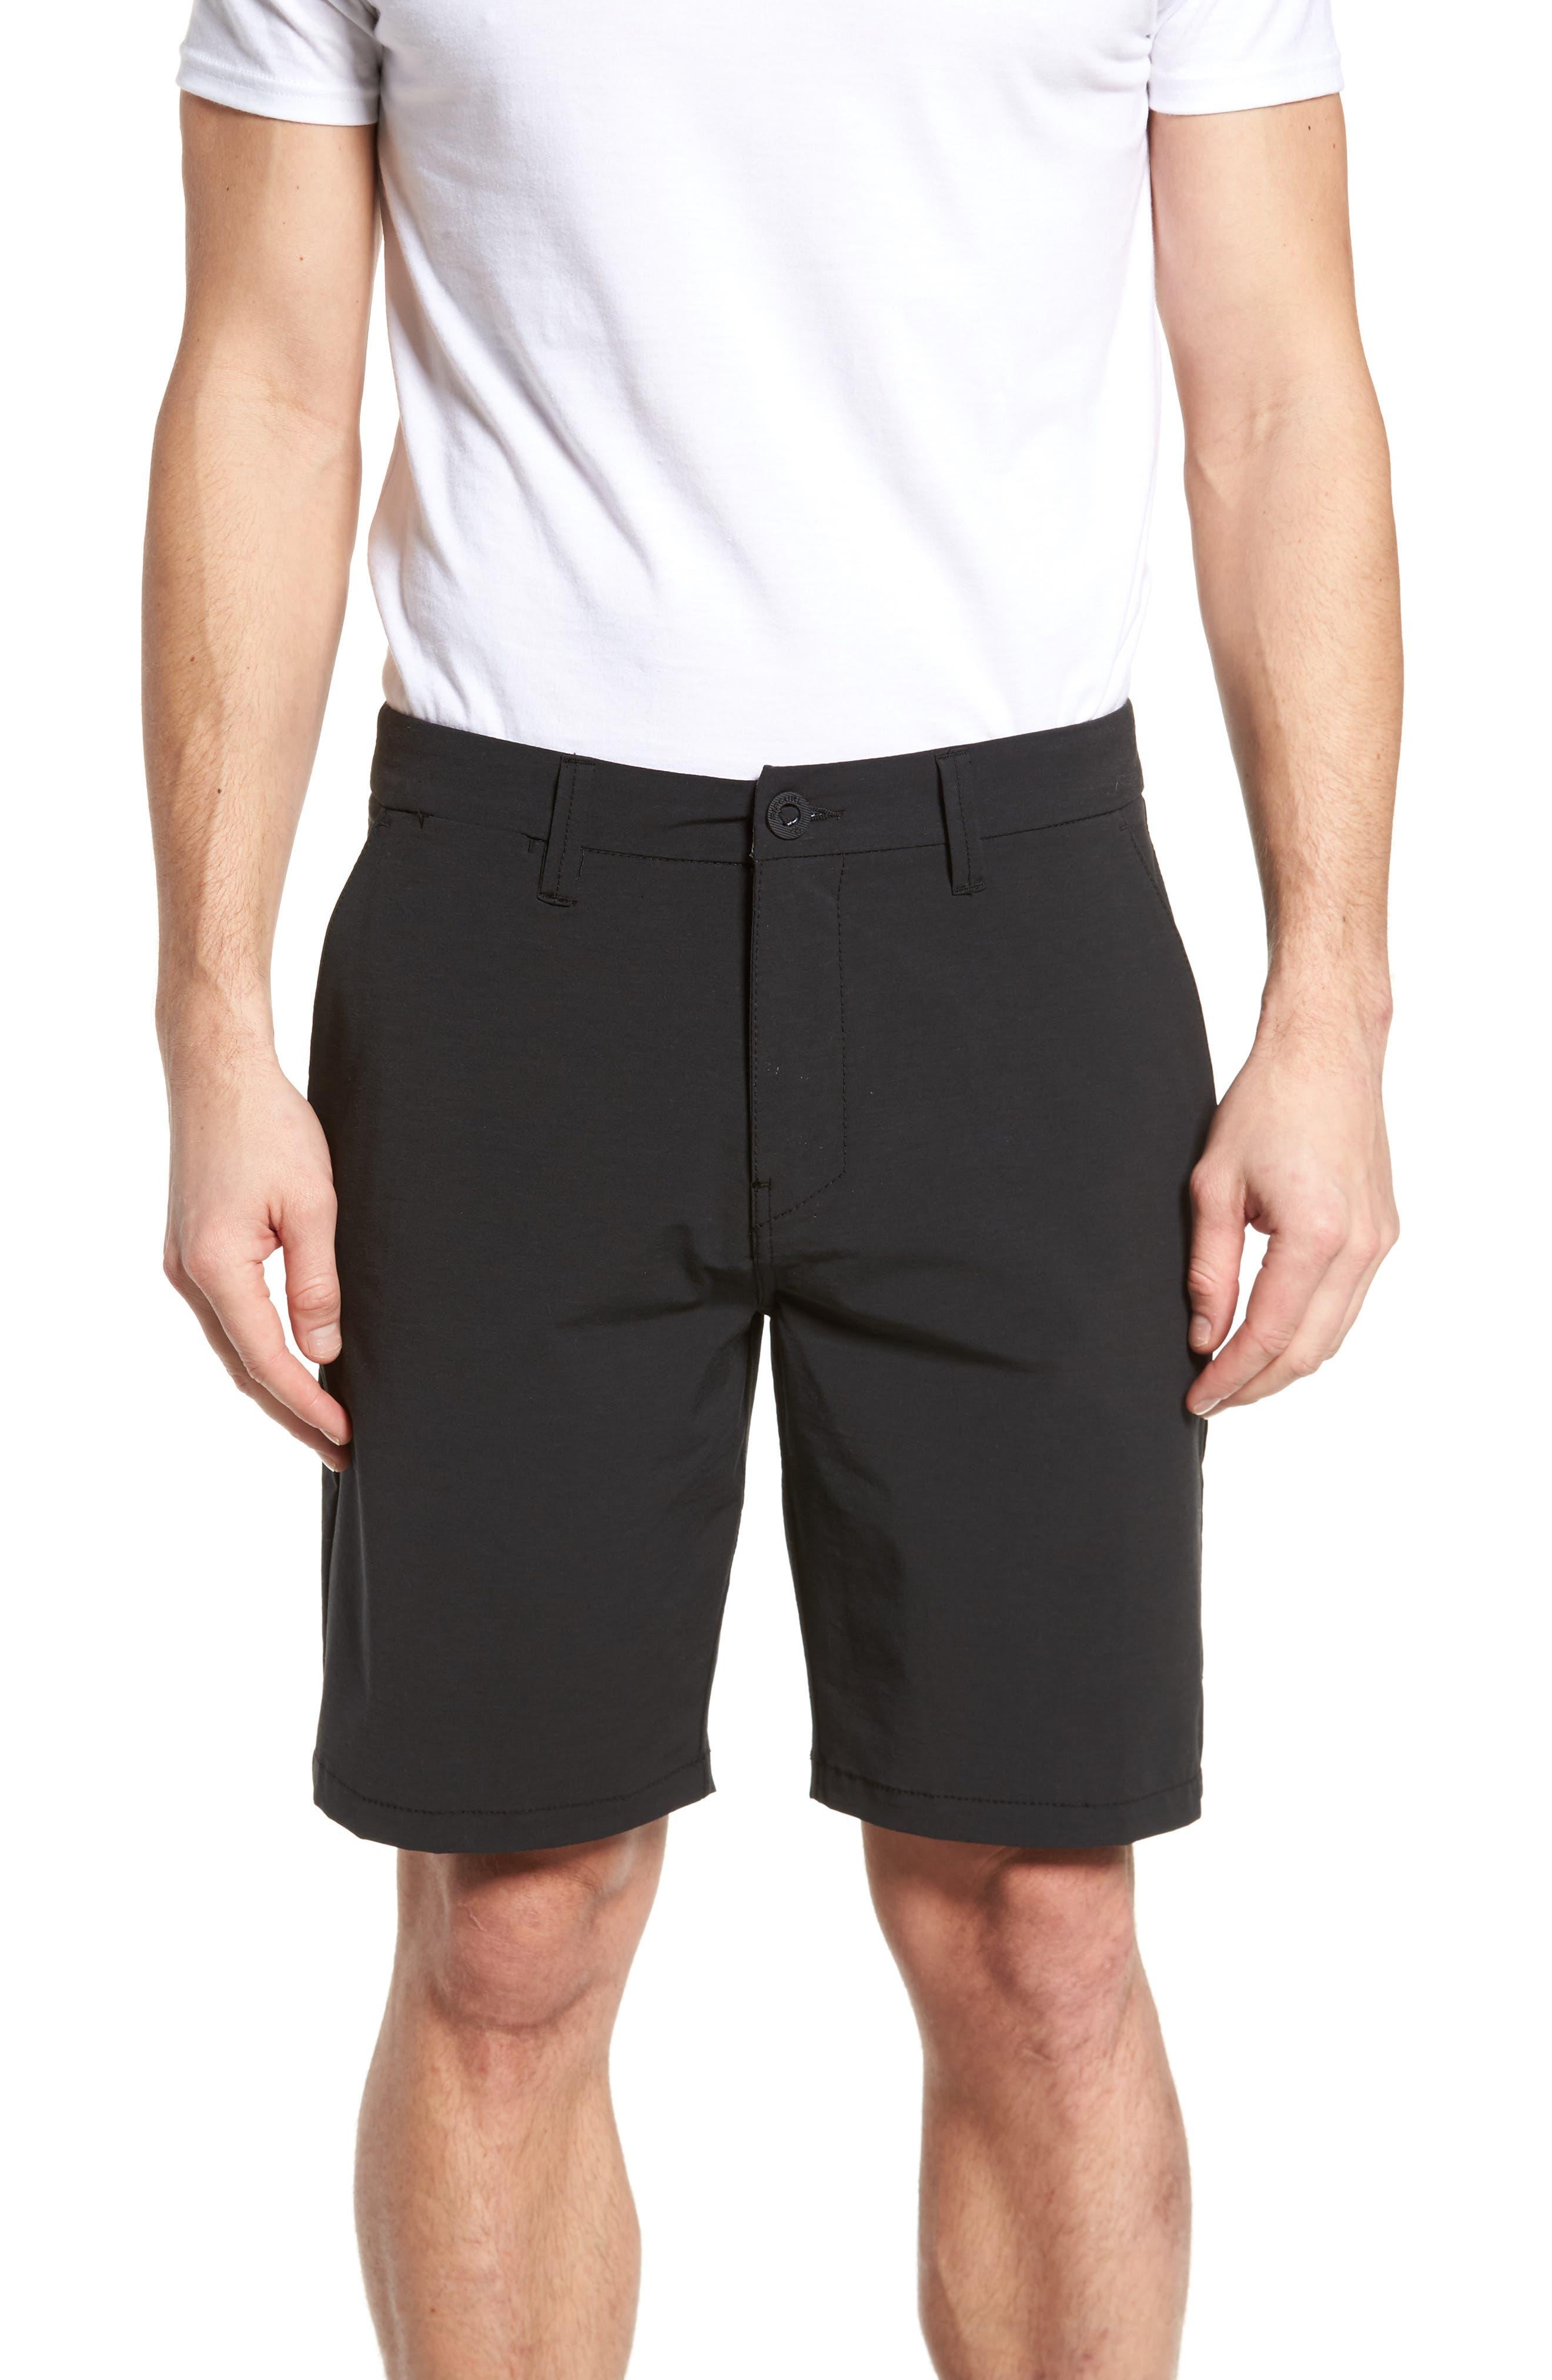 Mirage Records Boardwalk Shorts,                         Main,                         color, Grey